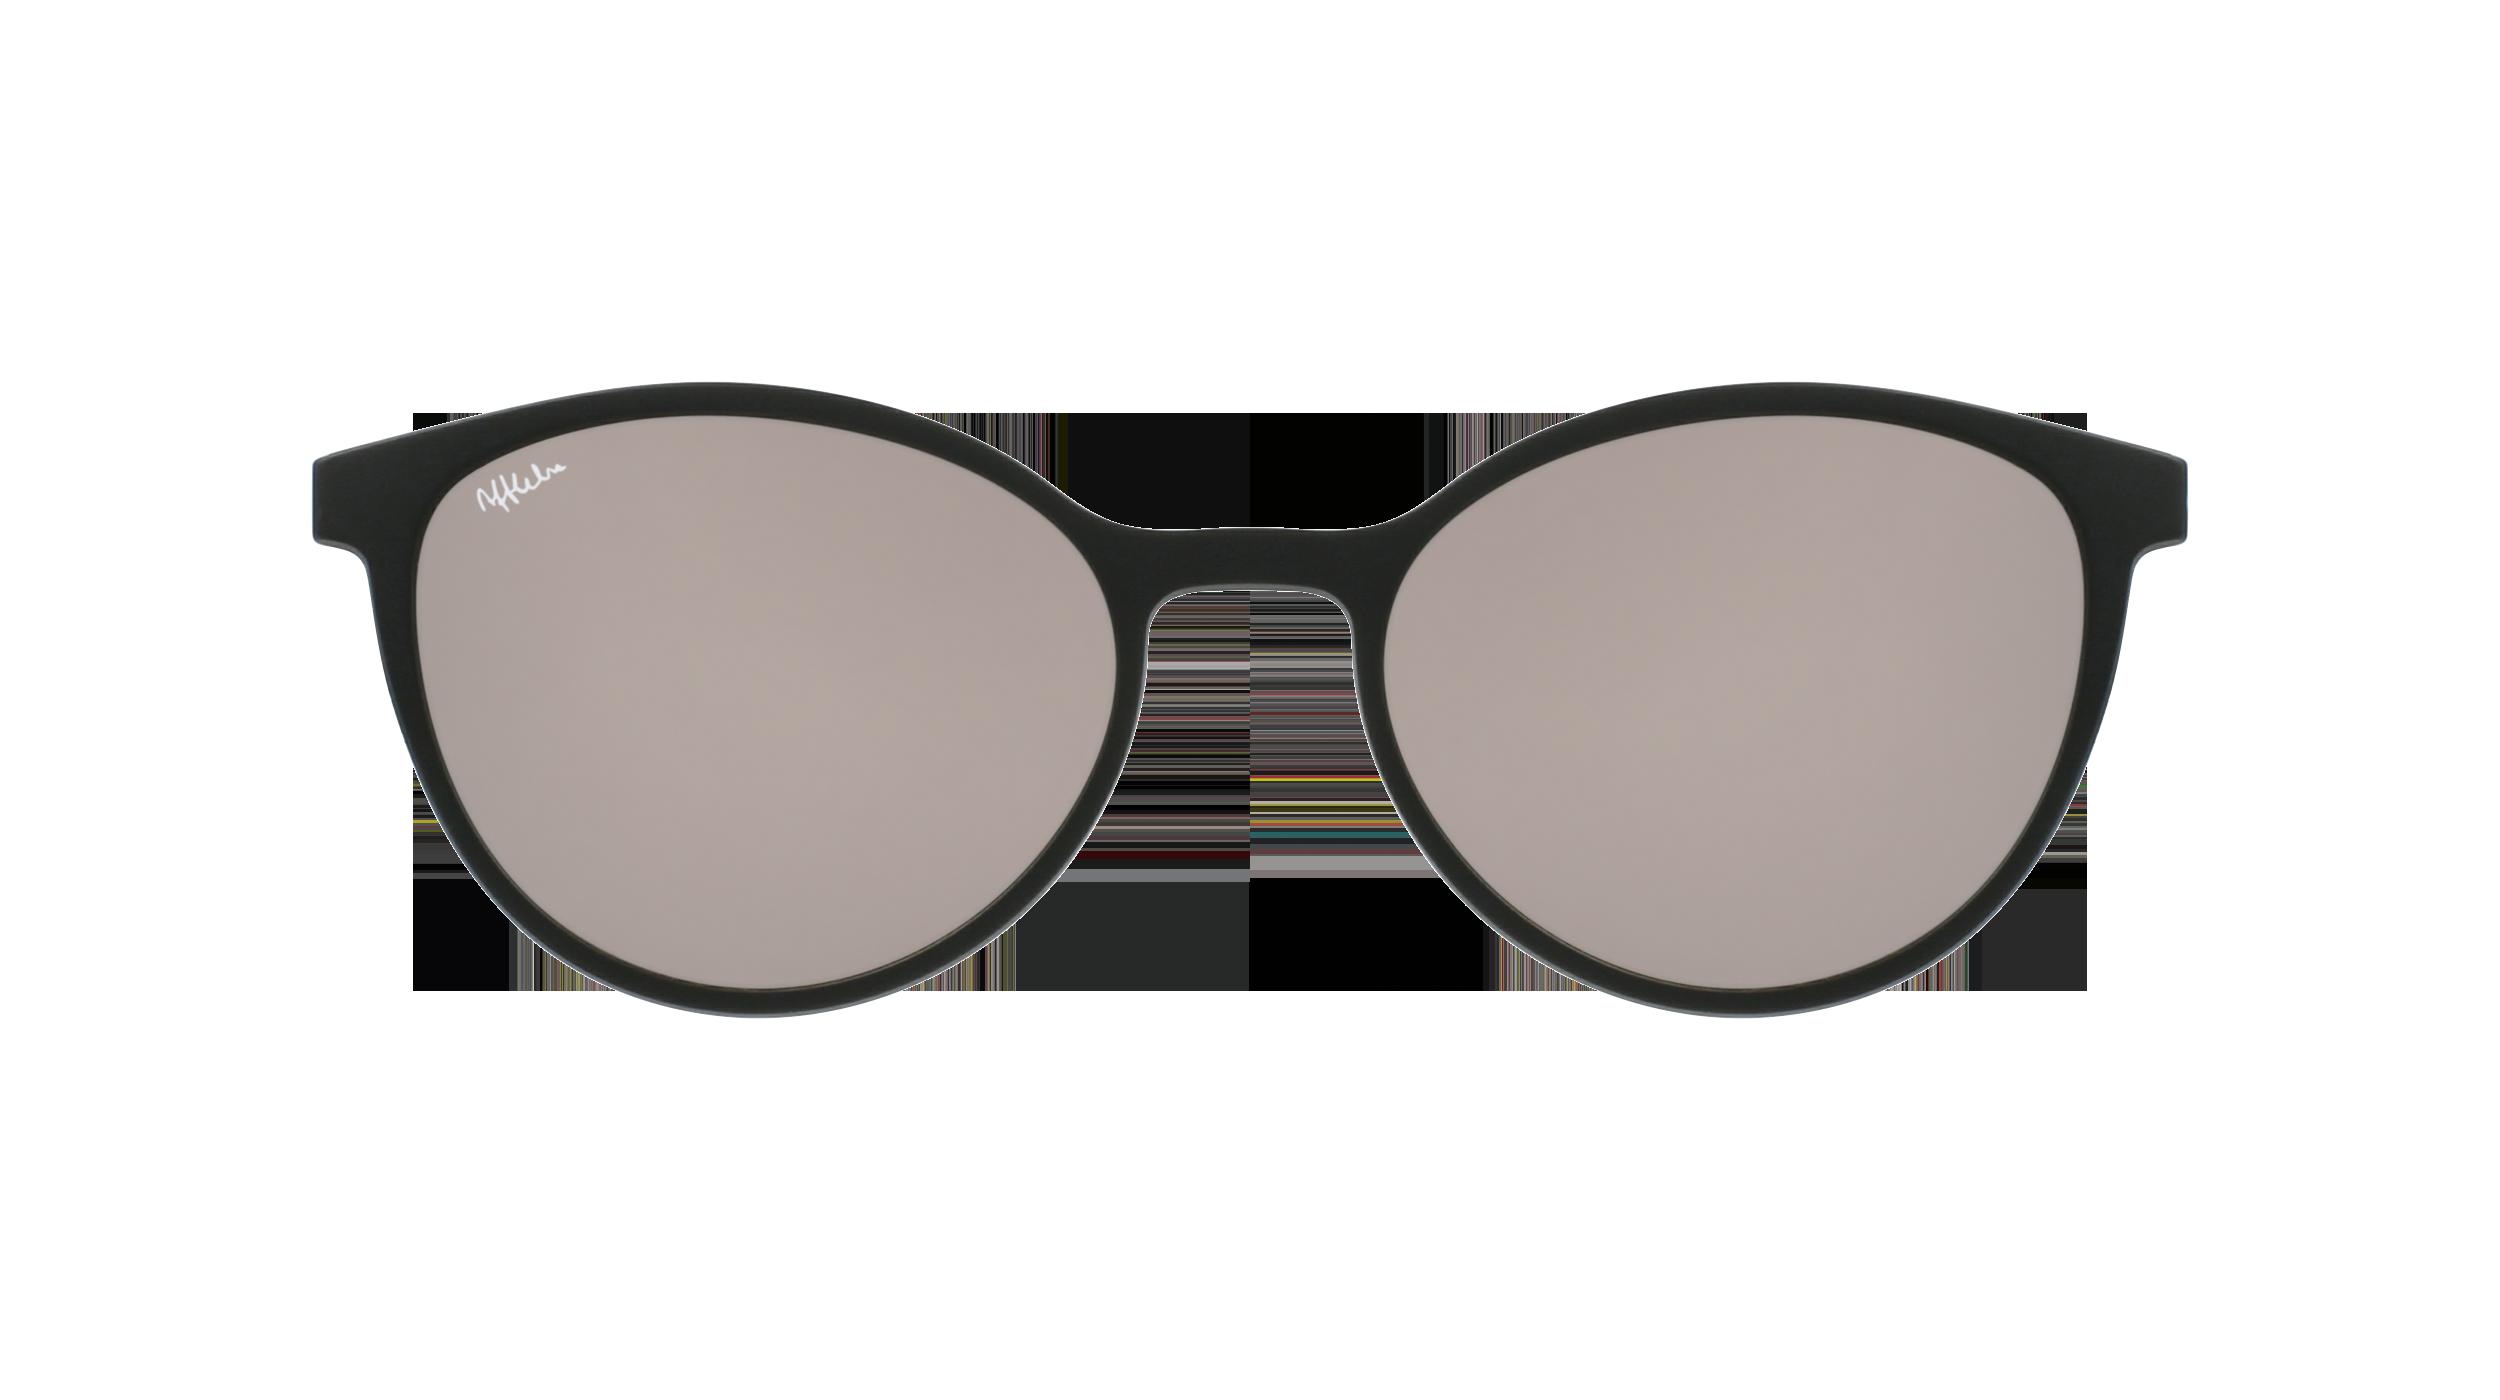 afflelou/france/products/smart_clip/clips_glasses/07630036458938.png